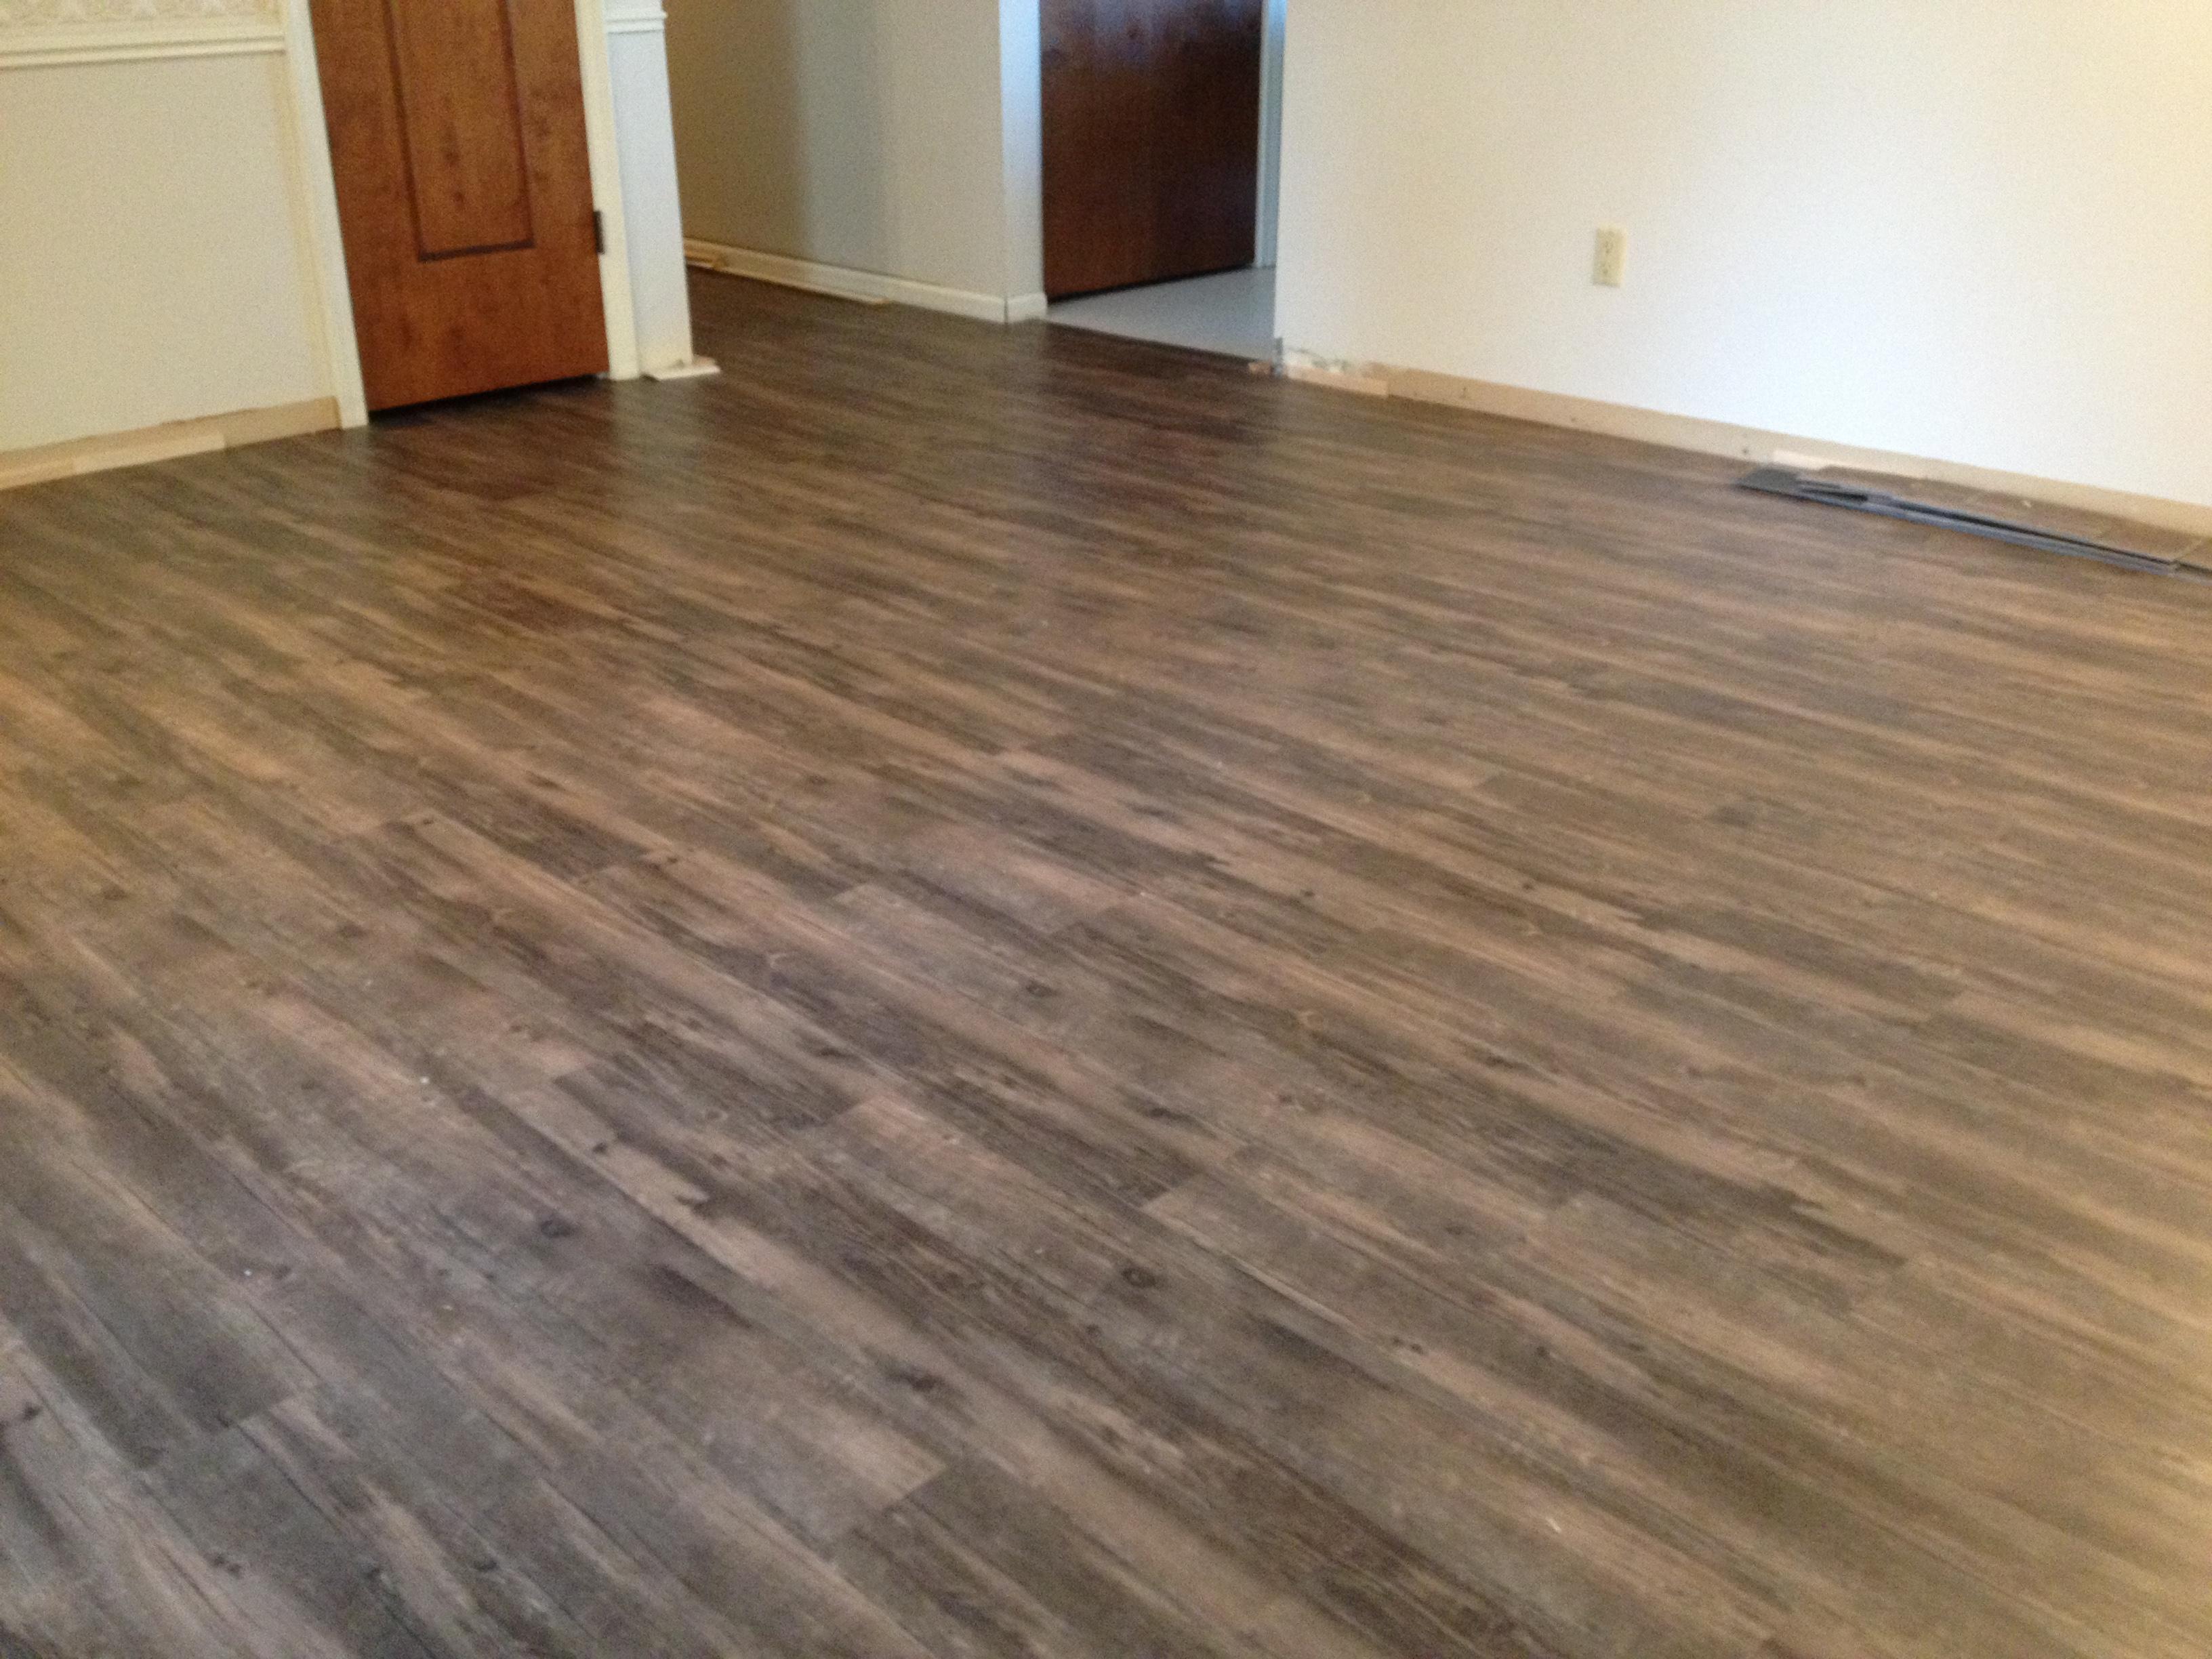 Garwood Hardwood Flooring